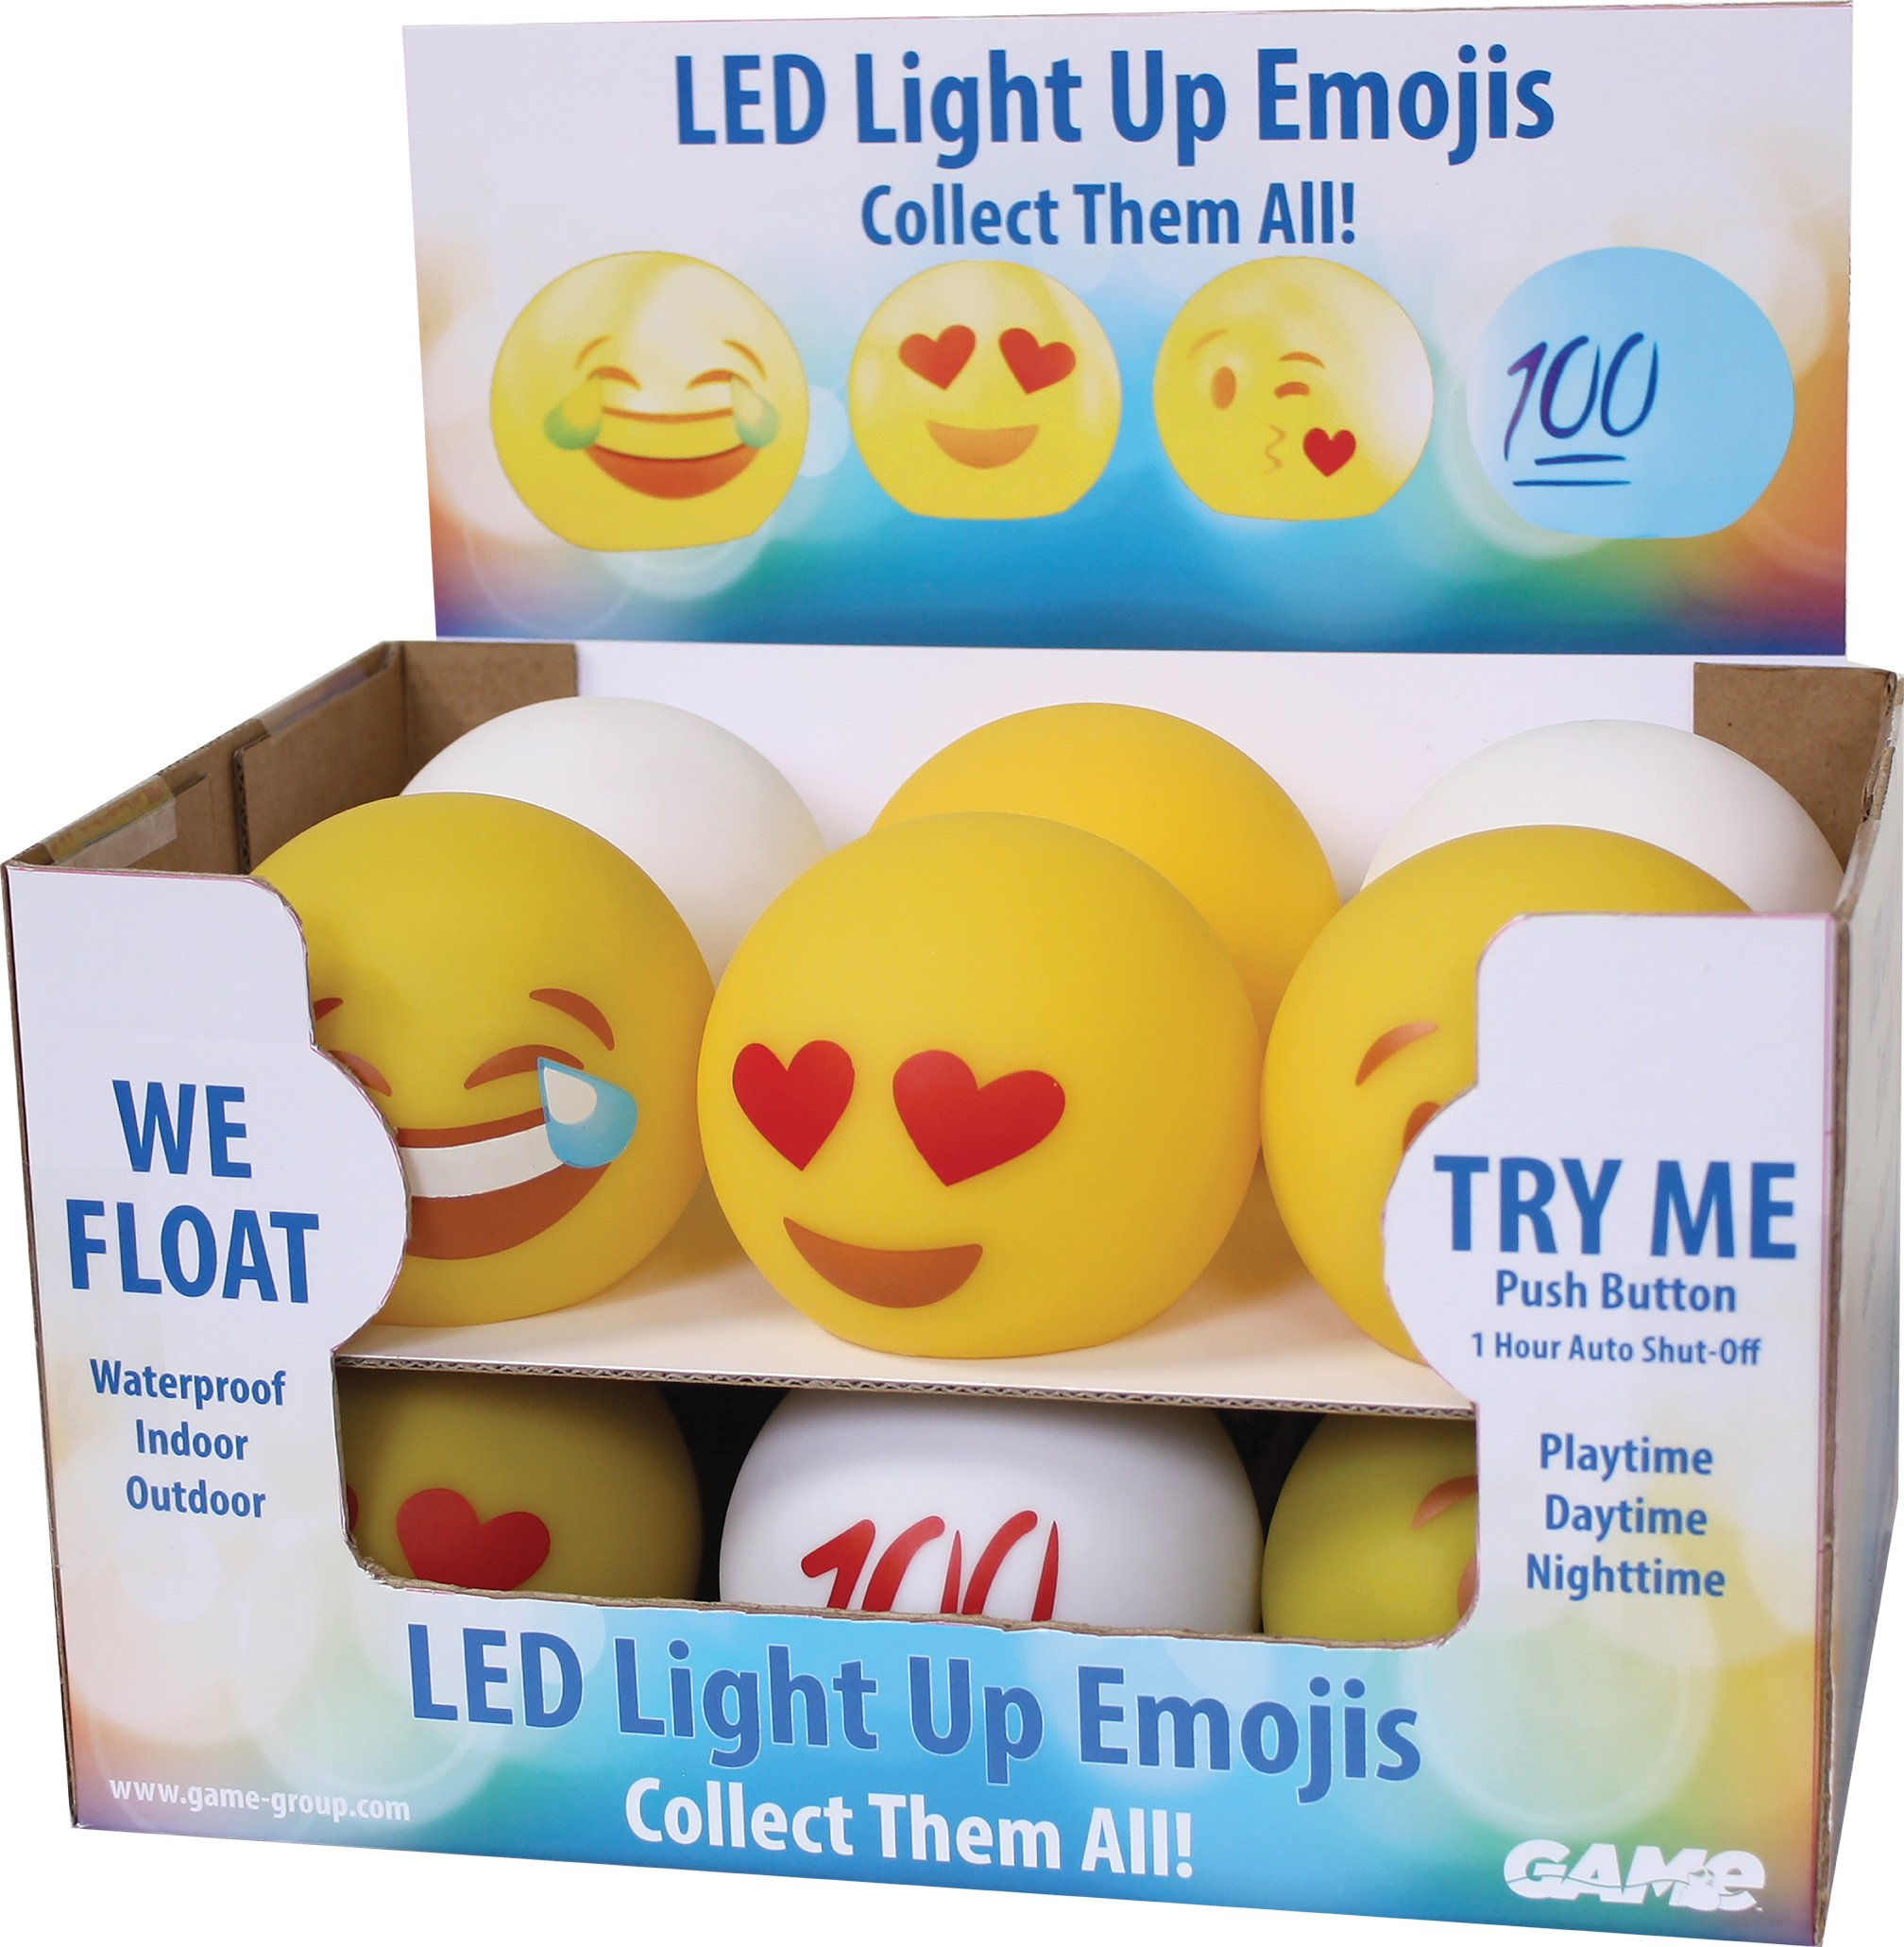 GAME Pool Floating LED Light Up Emojis (12 Assorted) POOL31181-12PQ